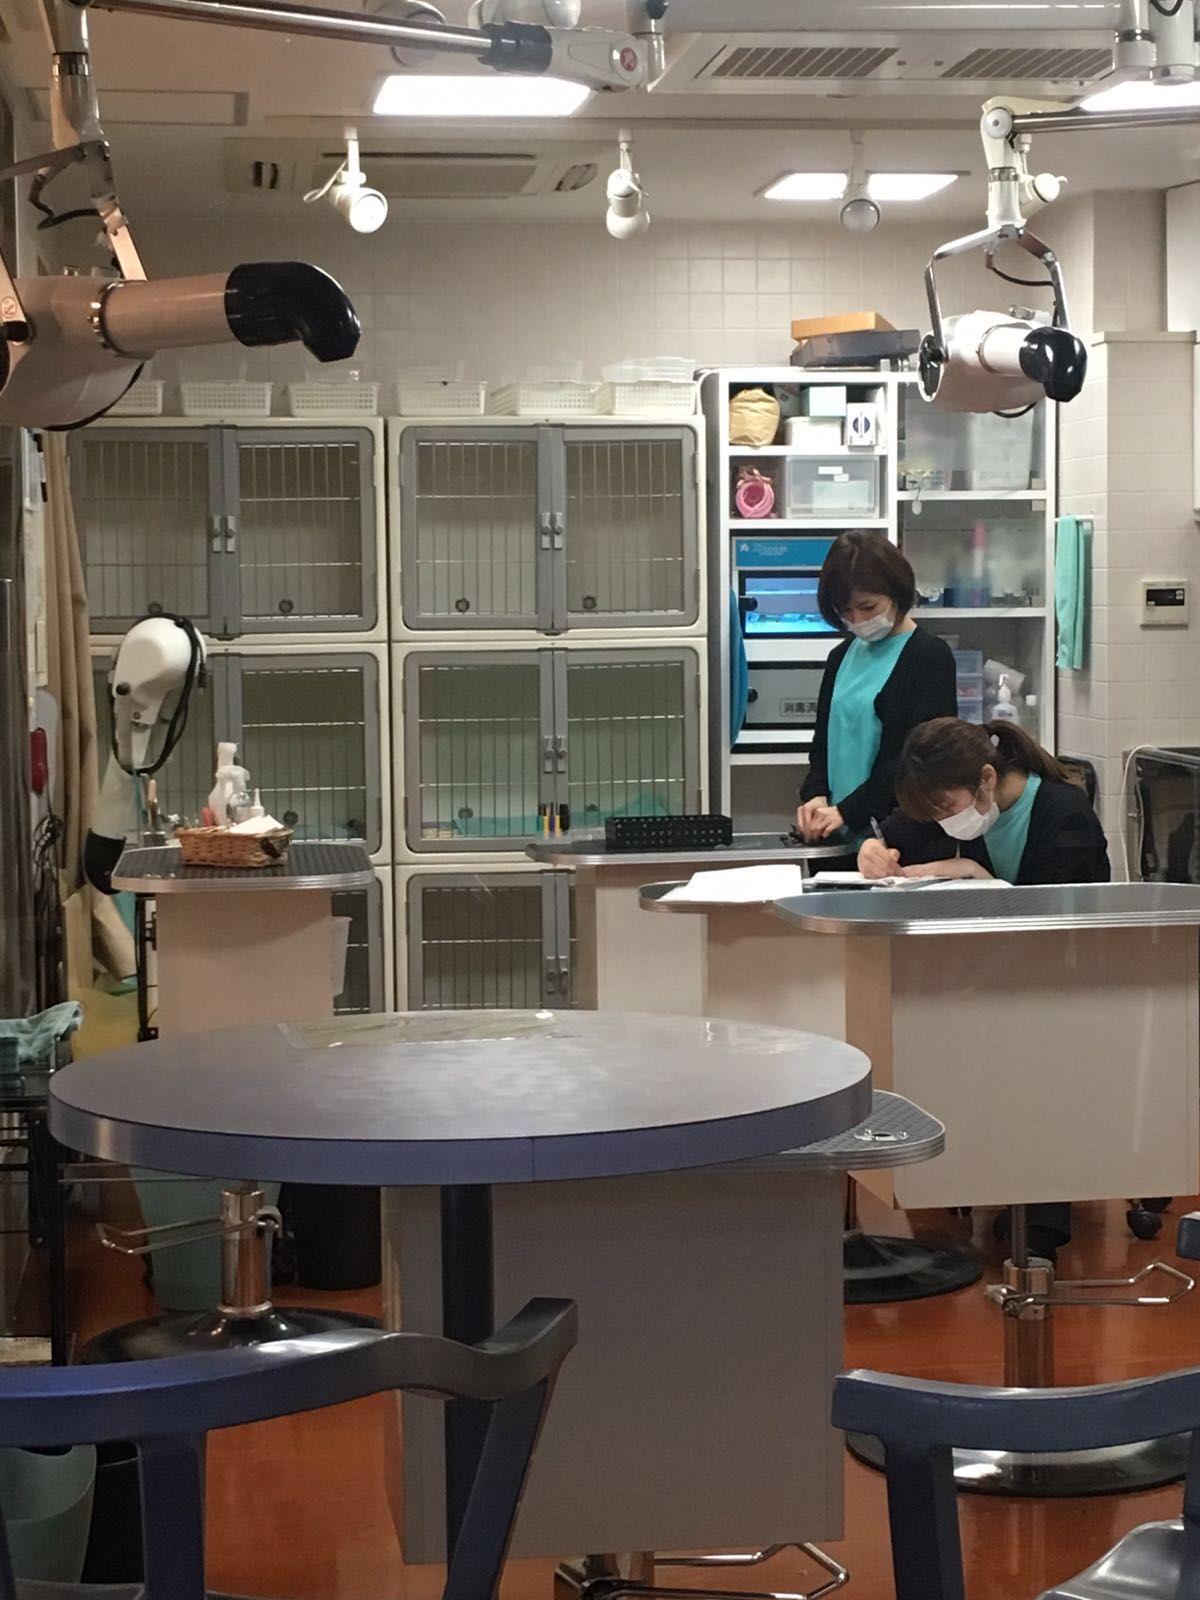 Grooming Salon In Tokyo Business Decor Grooming Salon Home Decor